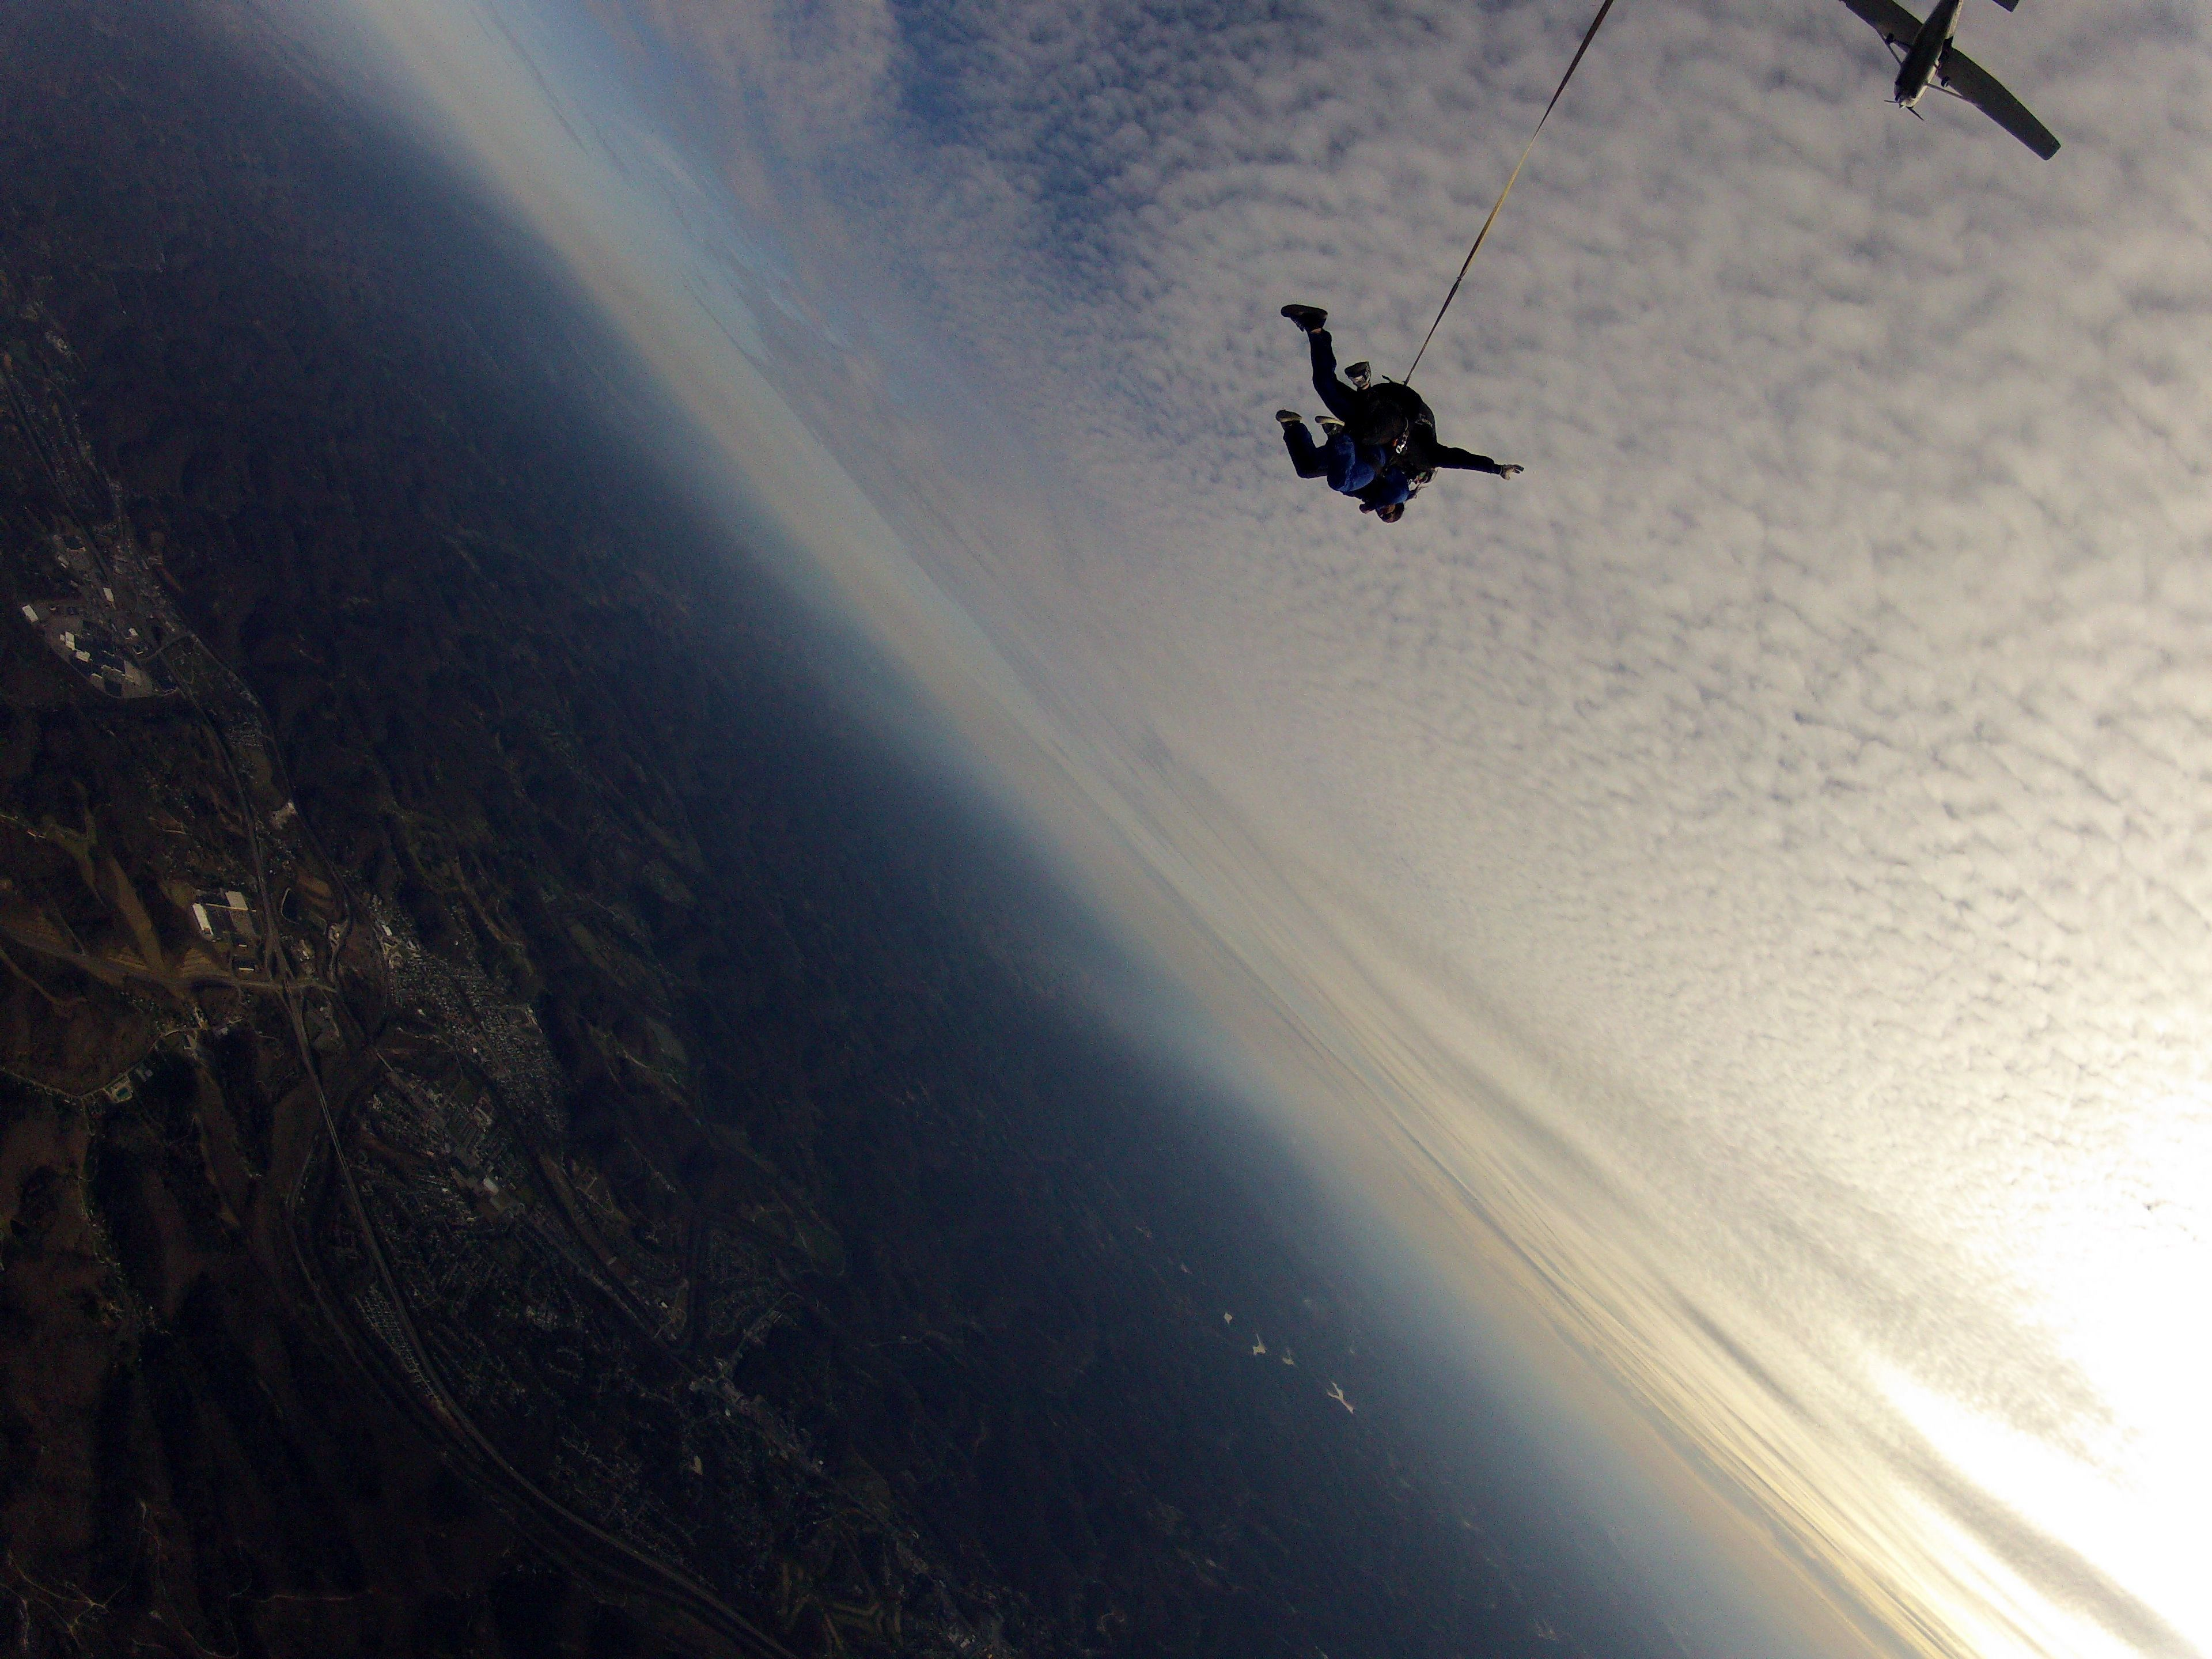 Http Skydivewv Com West Virginia Skydiving Pics